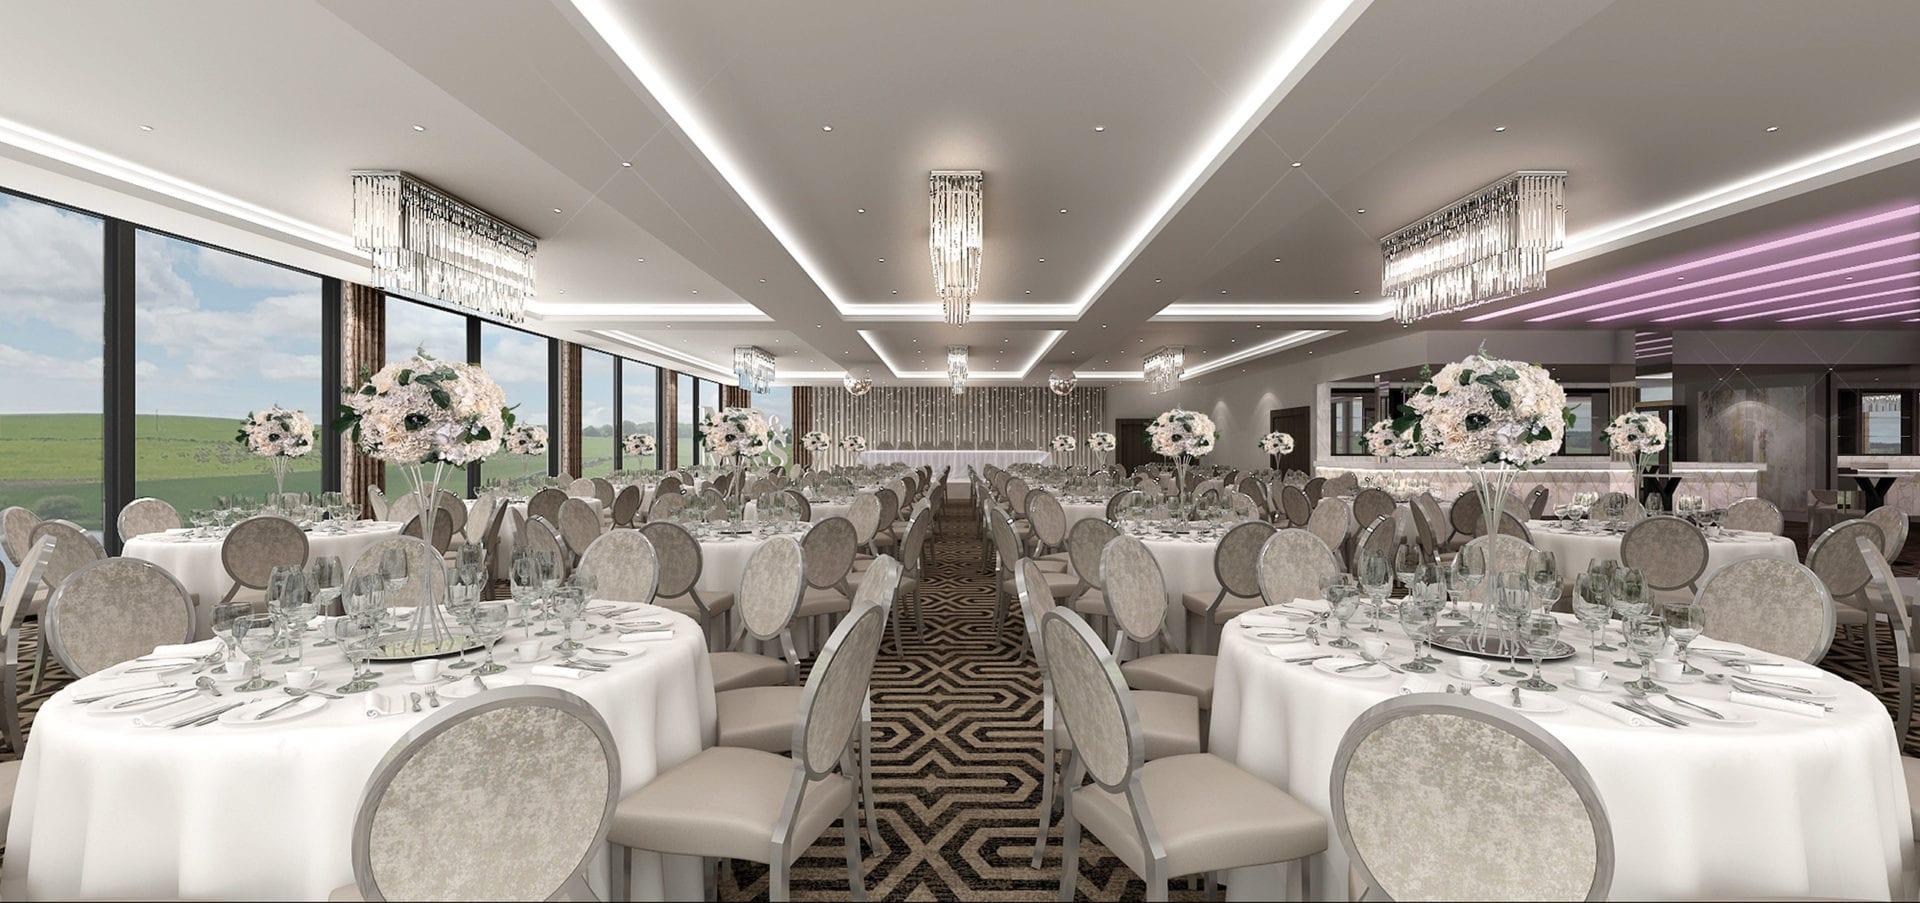 Lochside House Hotel Luxury Wedding Venue